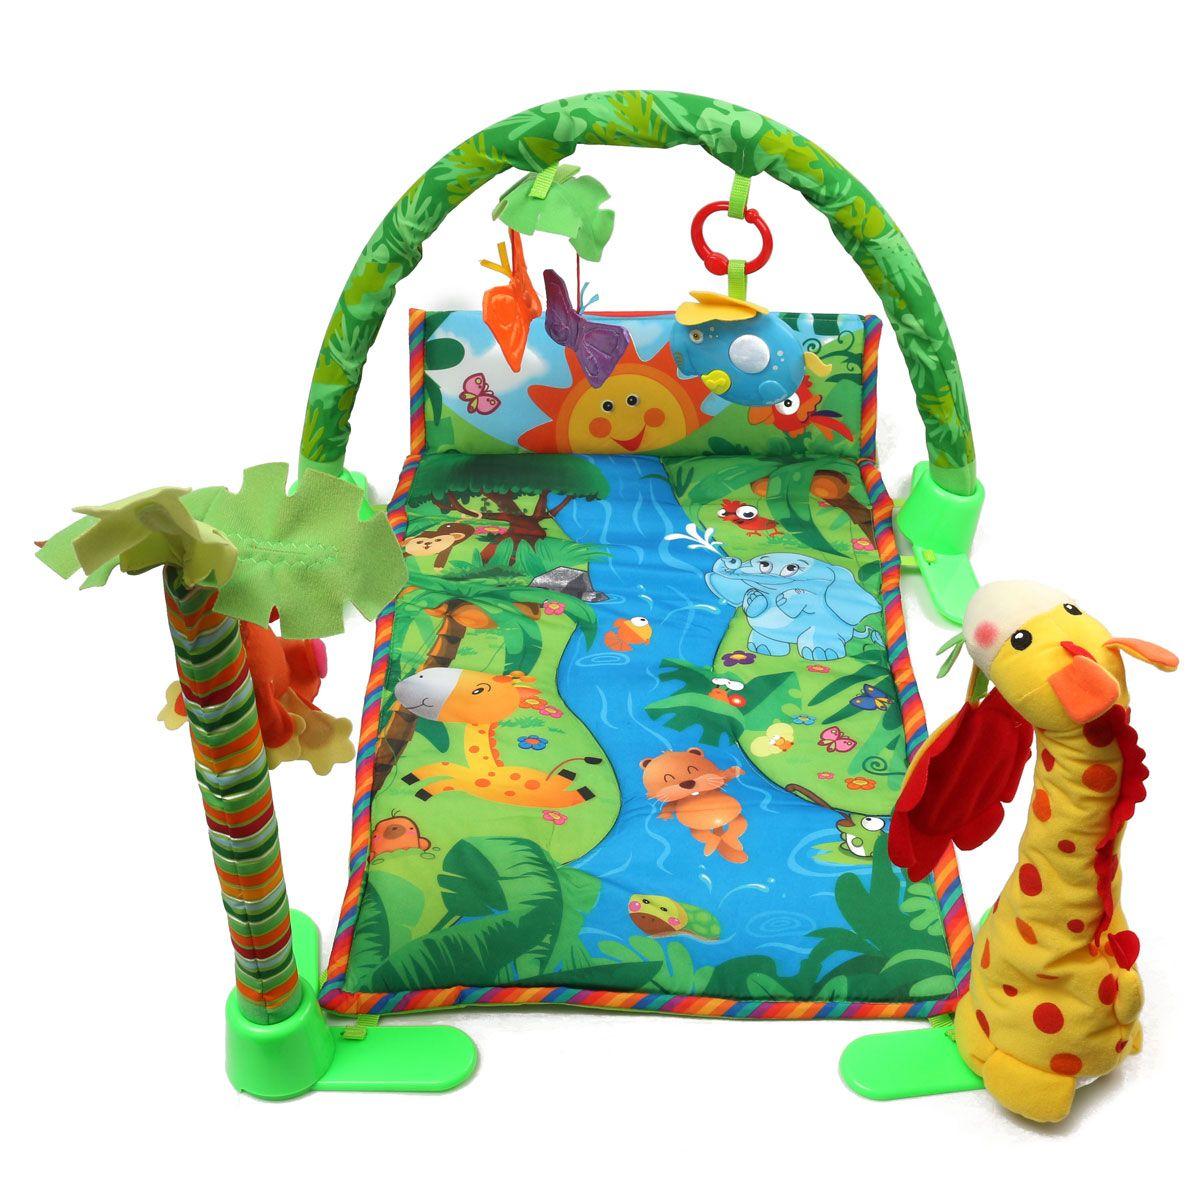 Rainforest Musical Baby Infant Activity Gym Floor Crawl